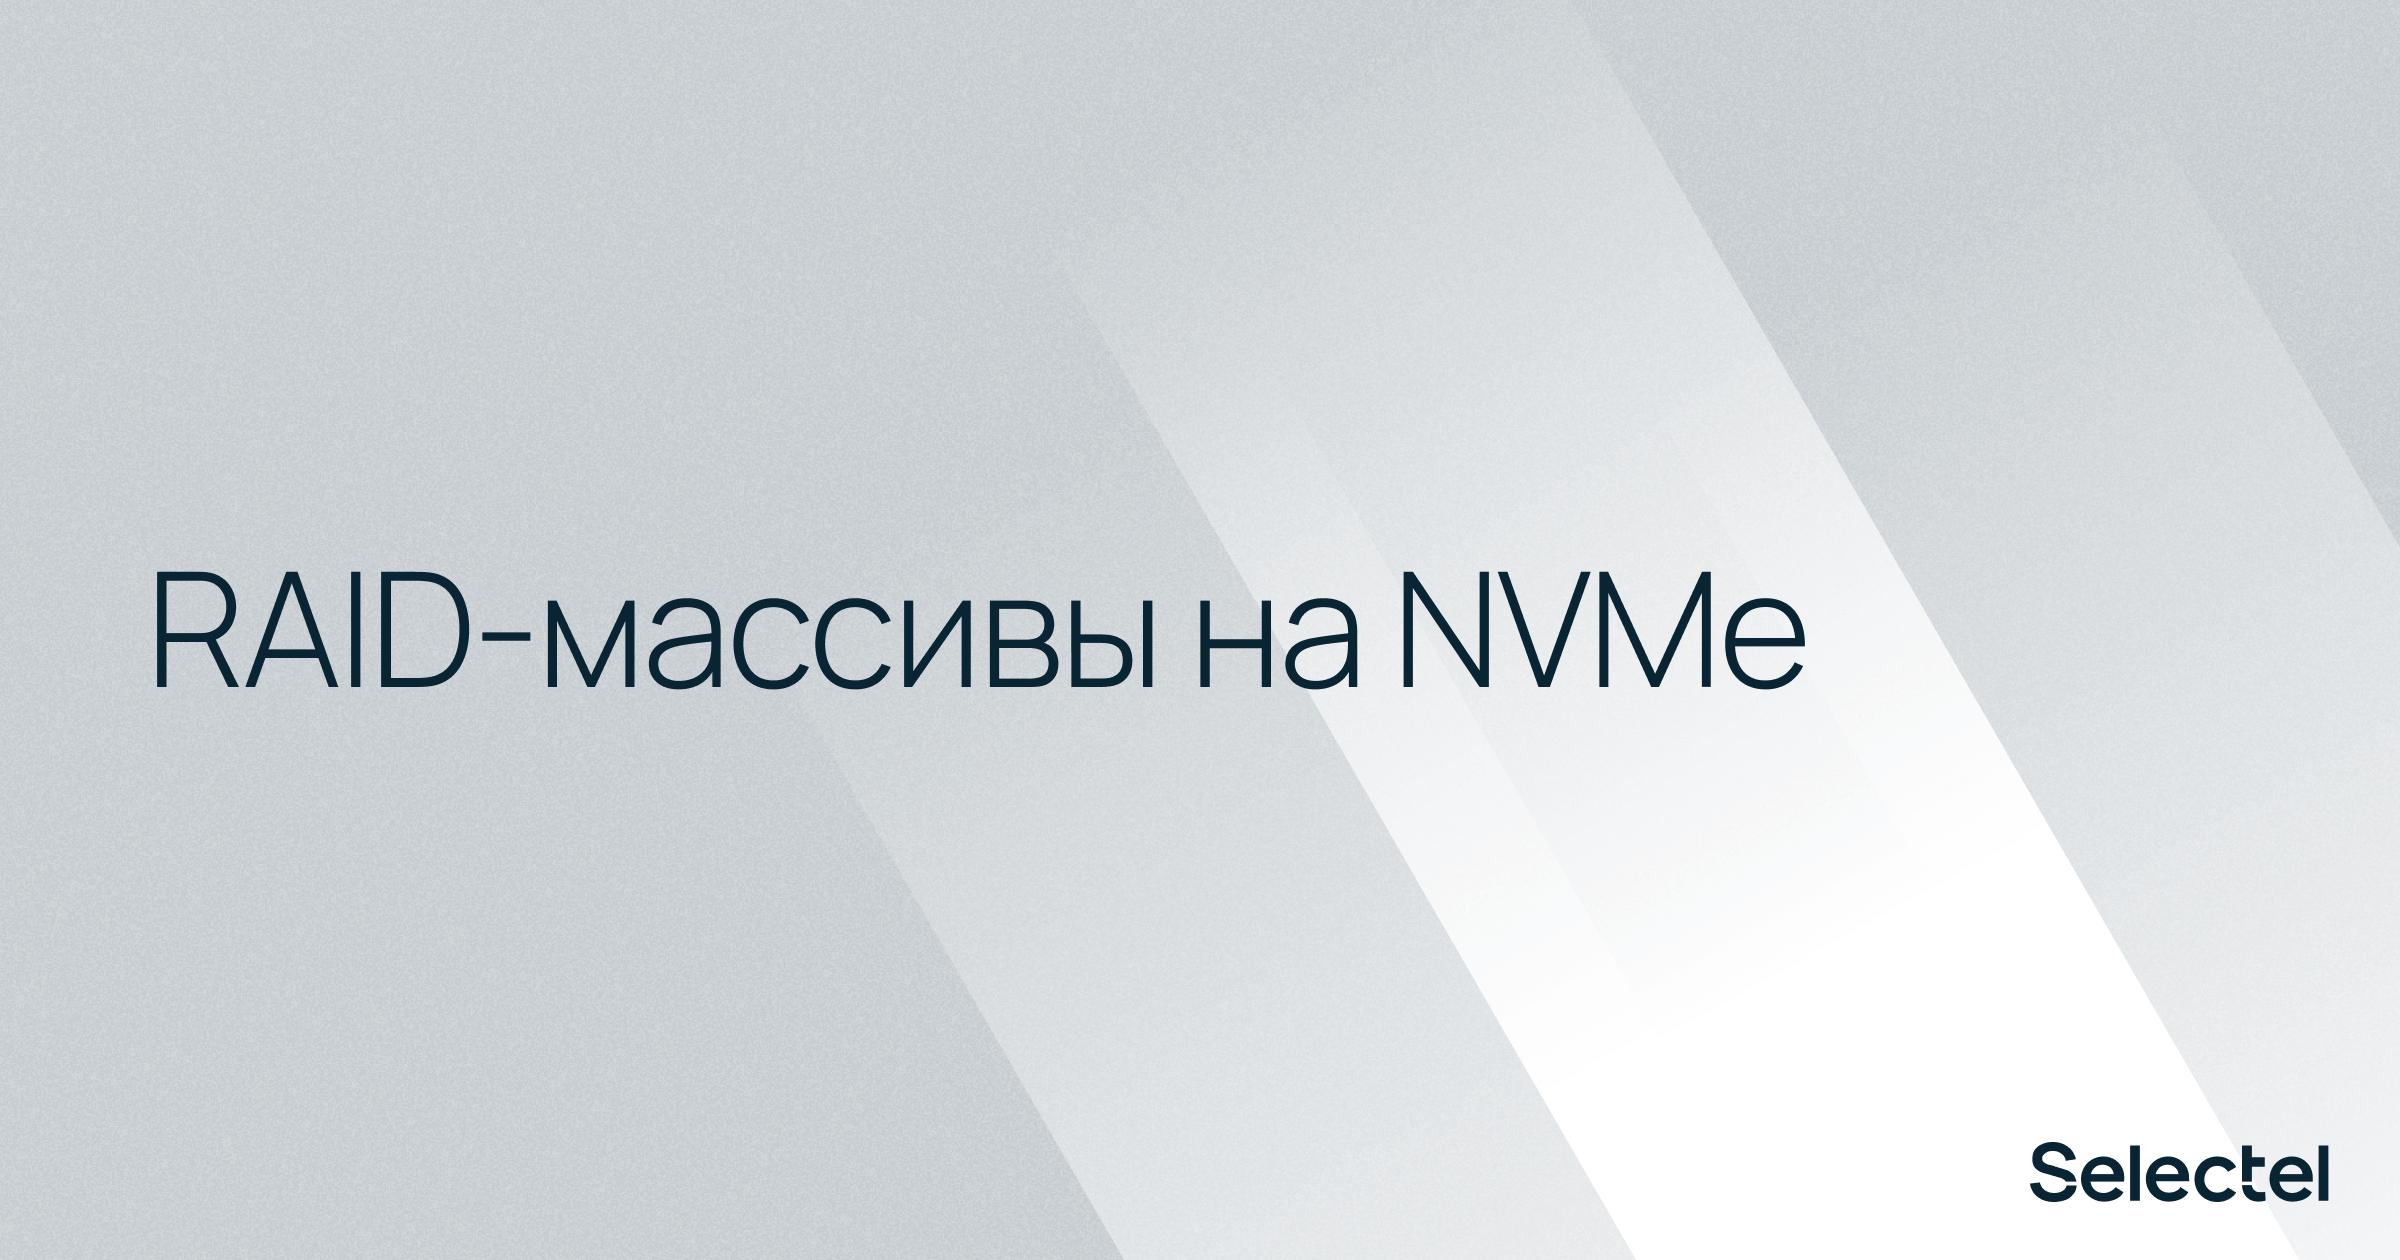 RAID-массивы на NVMe - 1